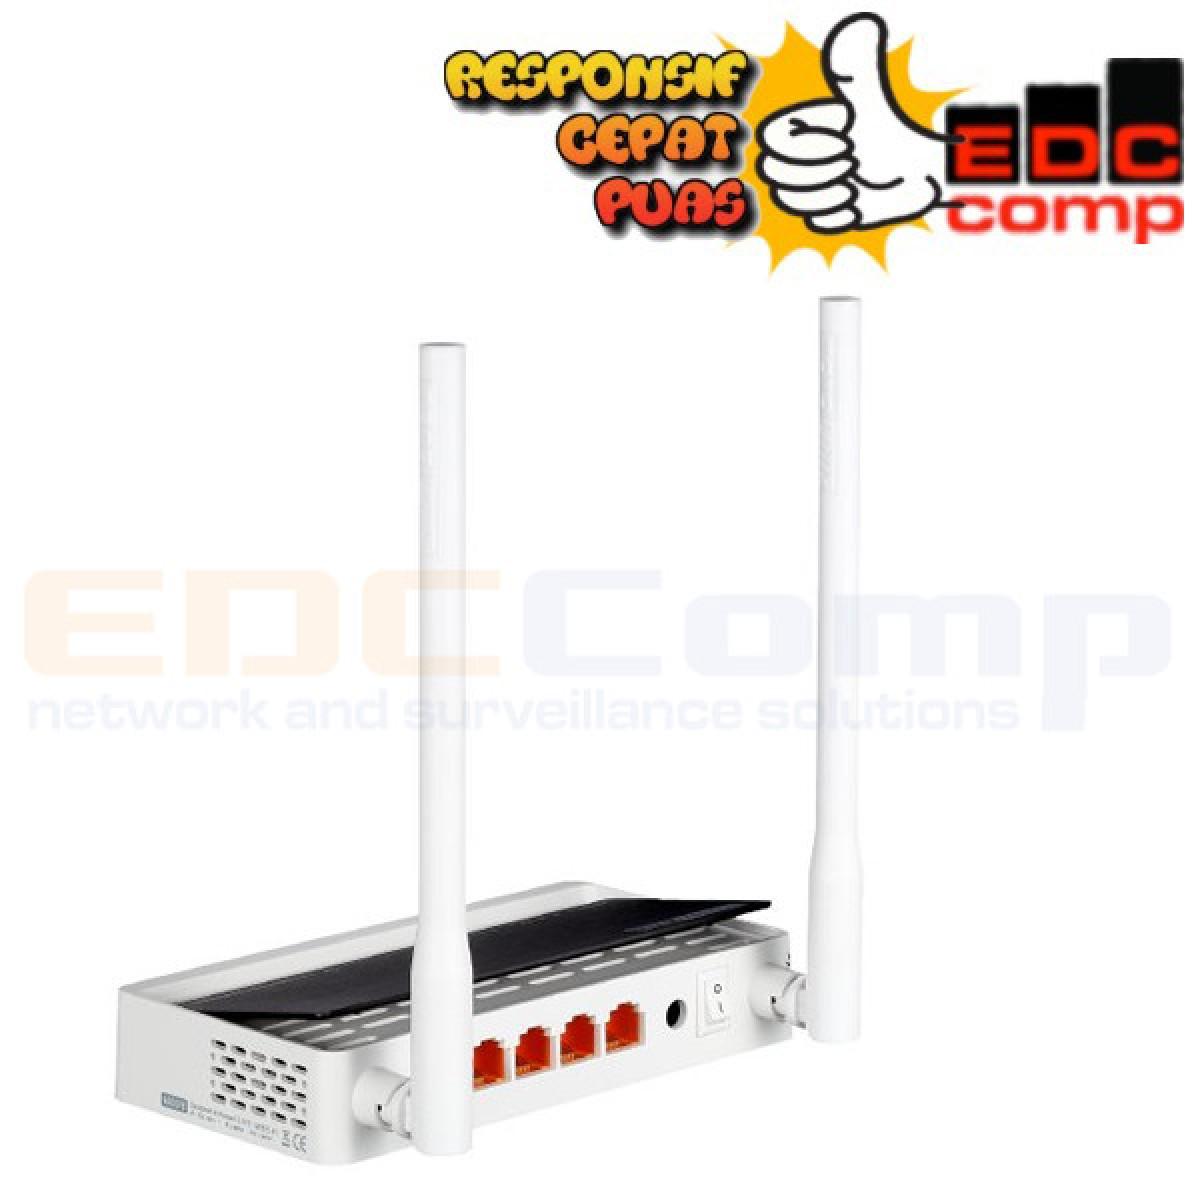 TotoLink 300 Mbps Wireless N Broadband Router - N300RT n300 - EdcComp